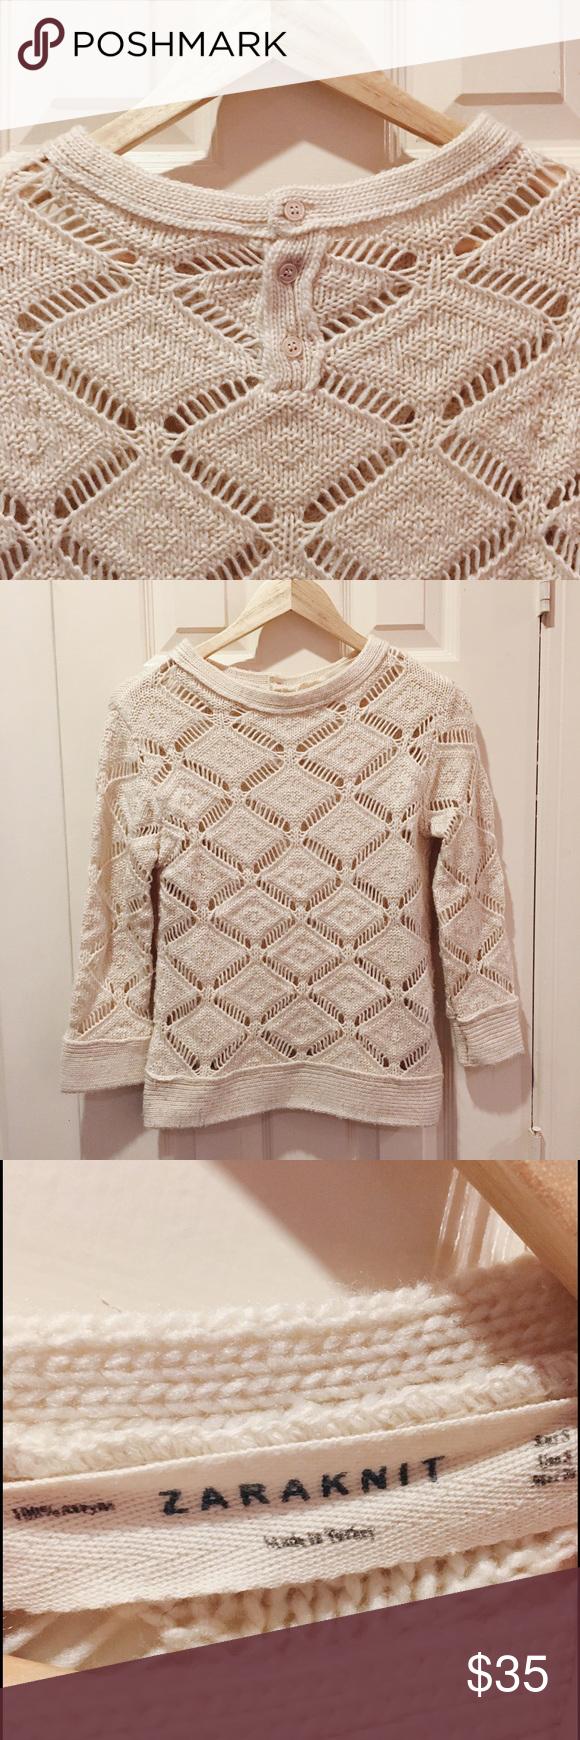 Zara // cream knit sweater | Scoop neck